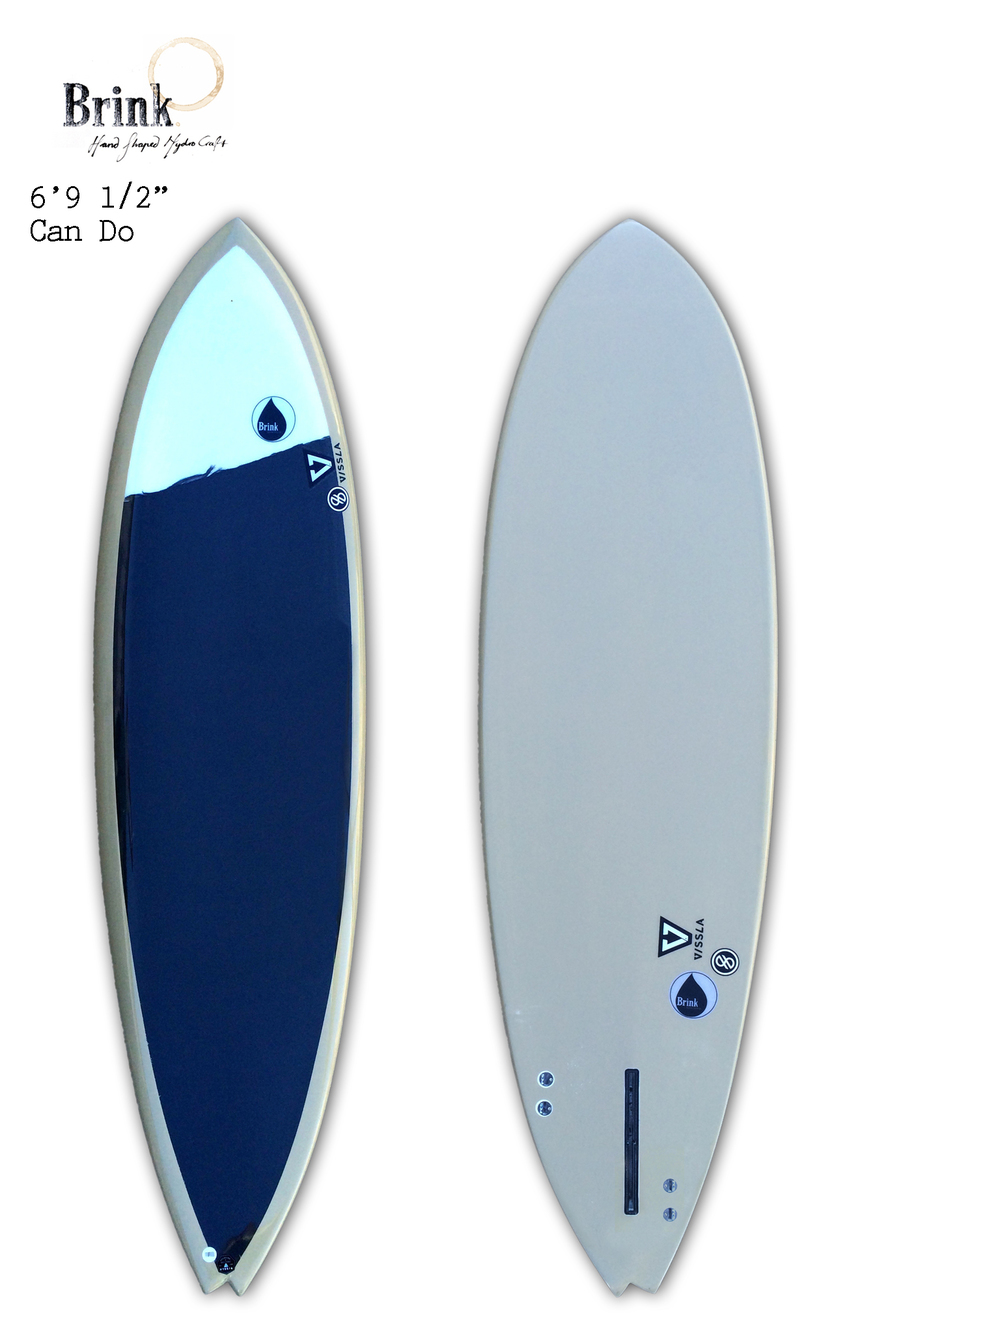 Brink_Surf_Board_CanDo.jpg